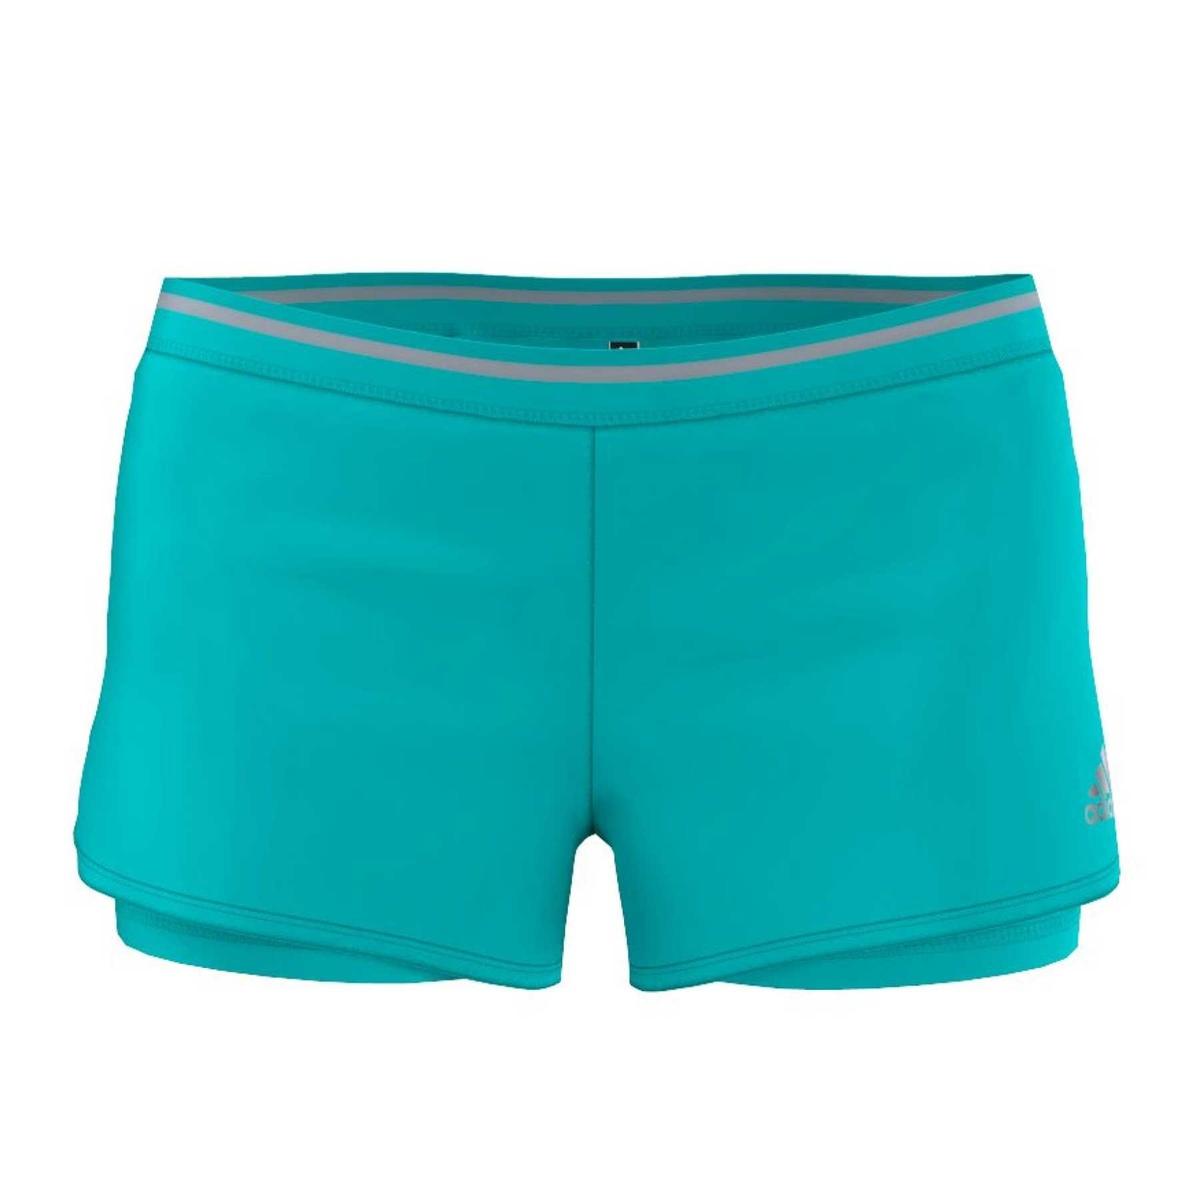 Pantaloncino climachill donna